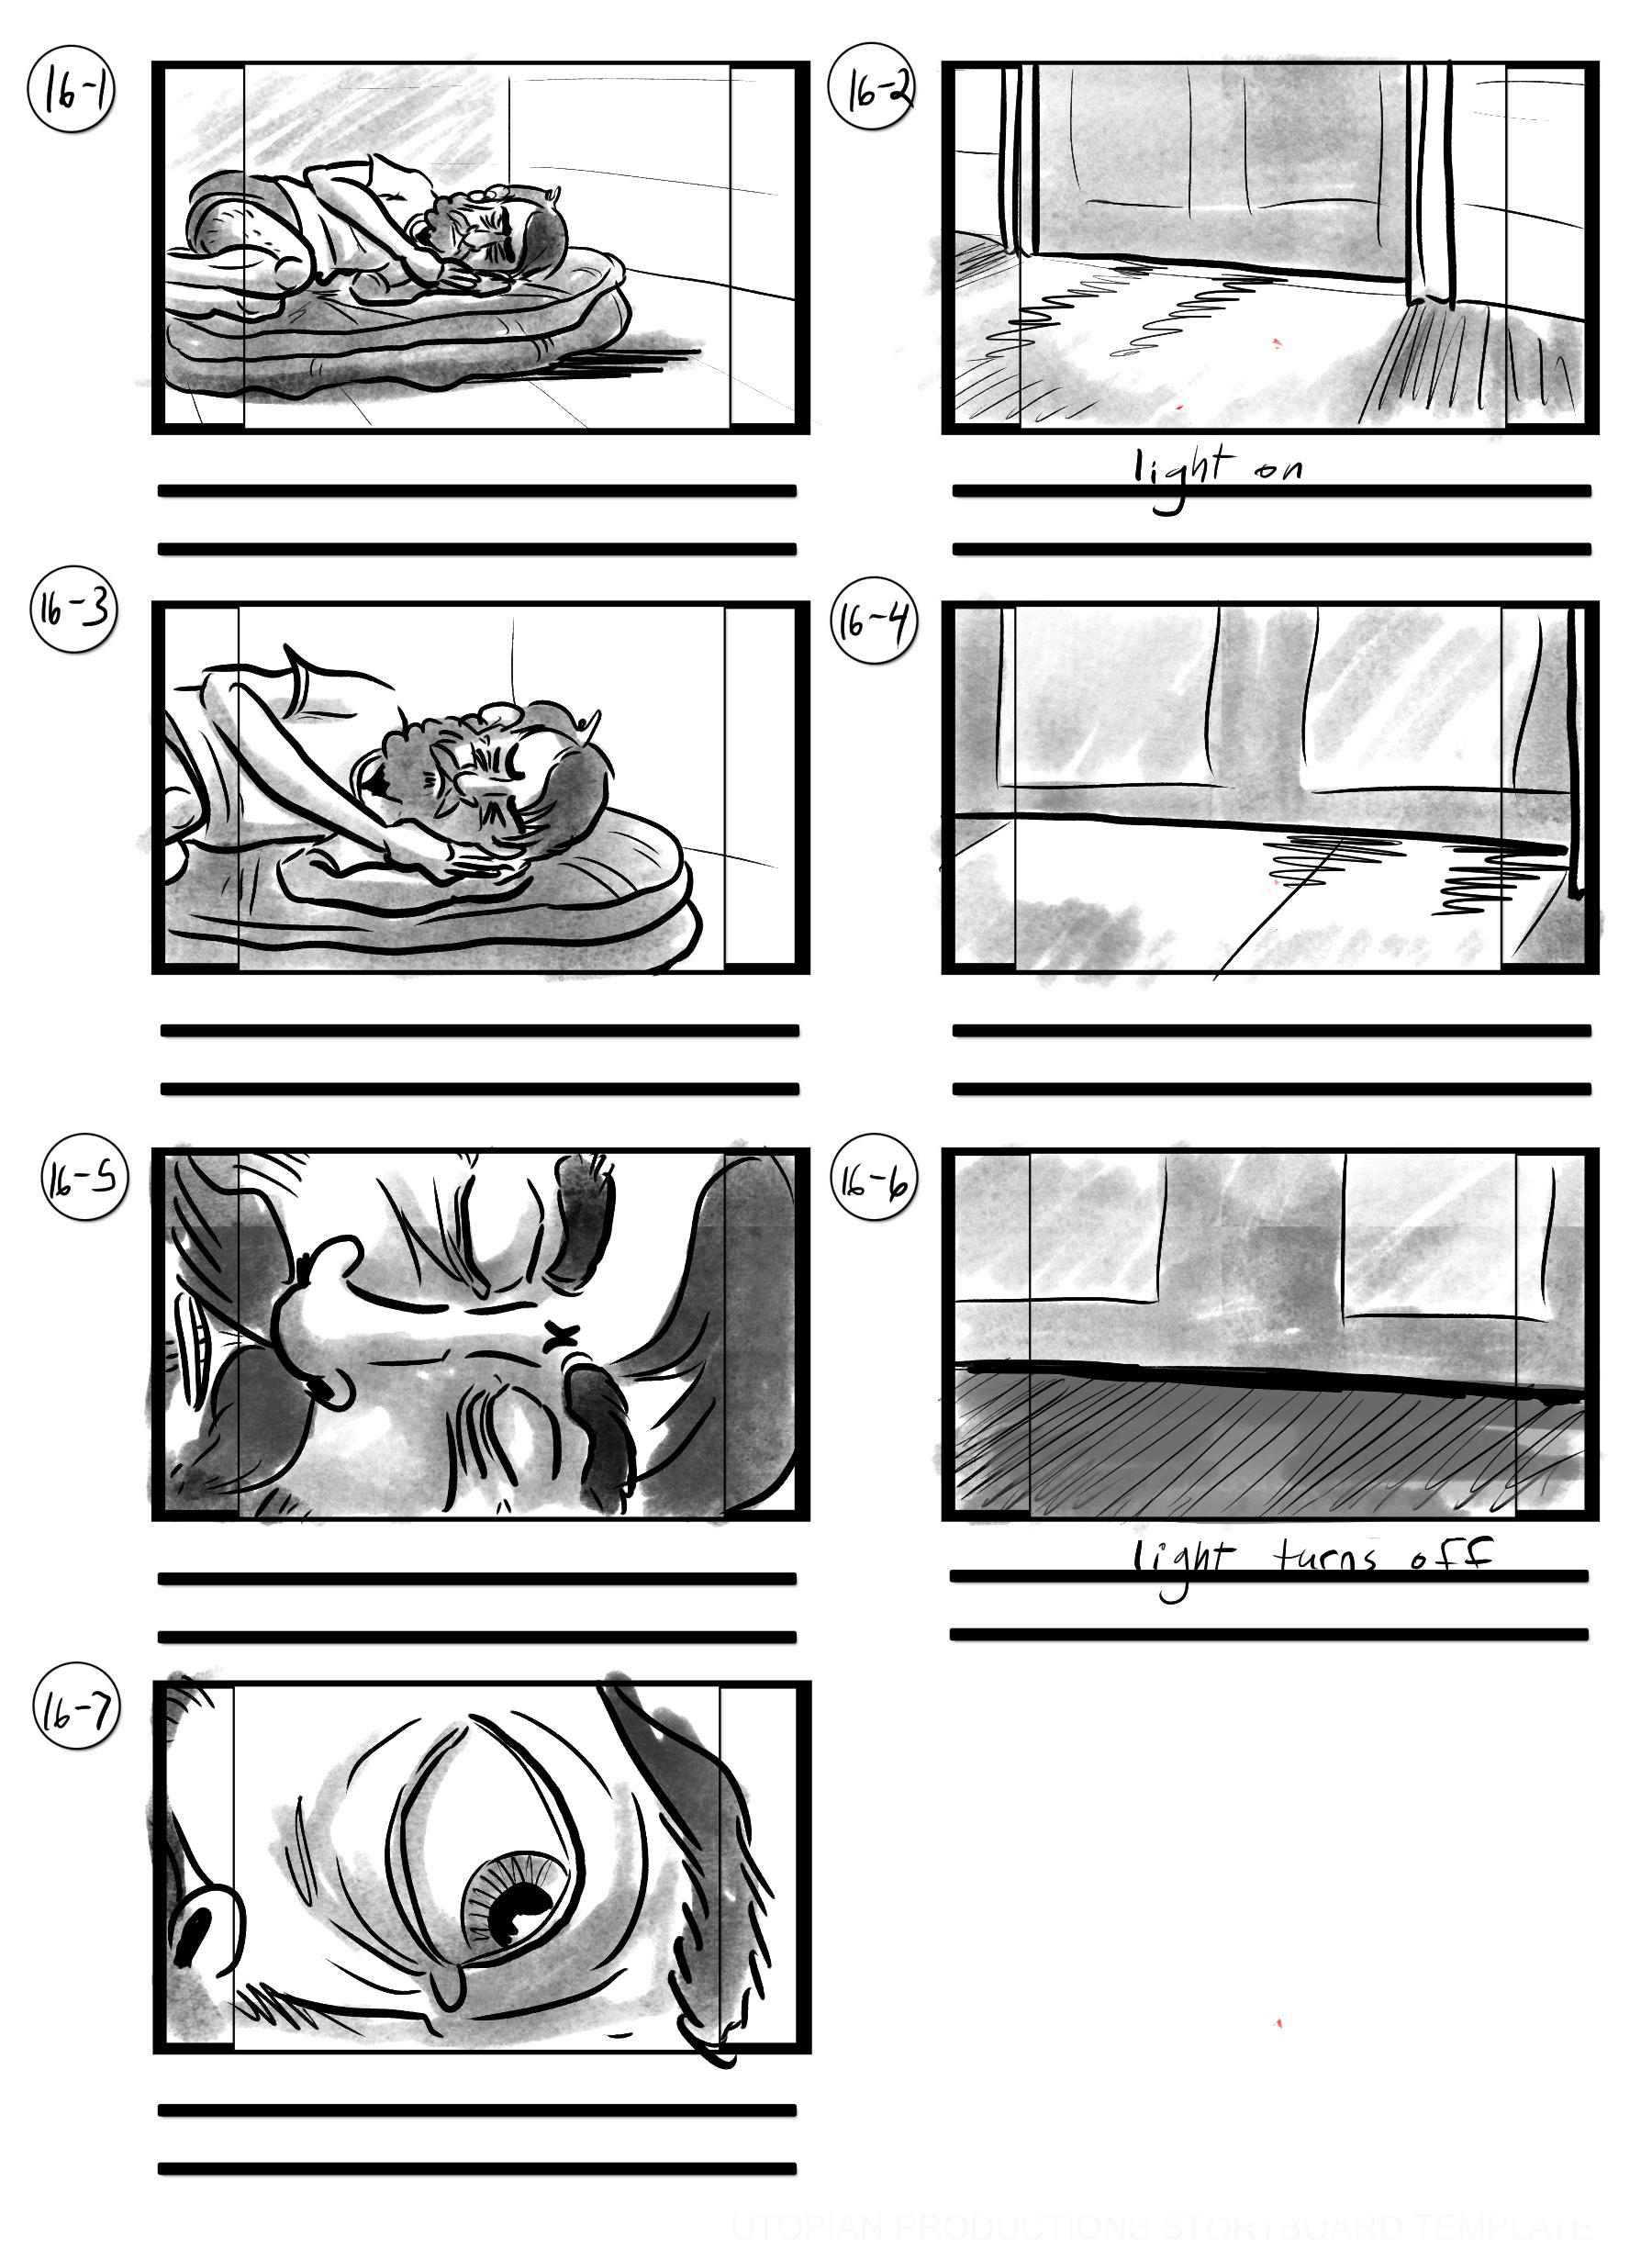 The Dog The Boy storyboard 16-1.jpg